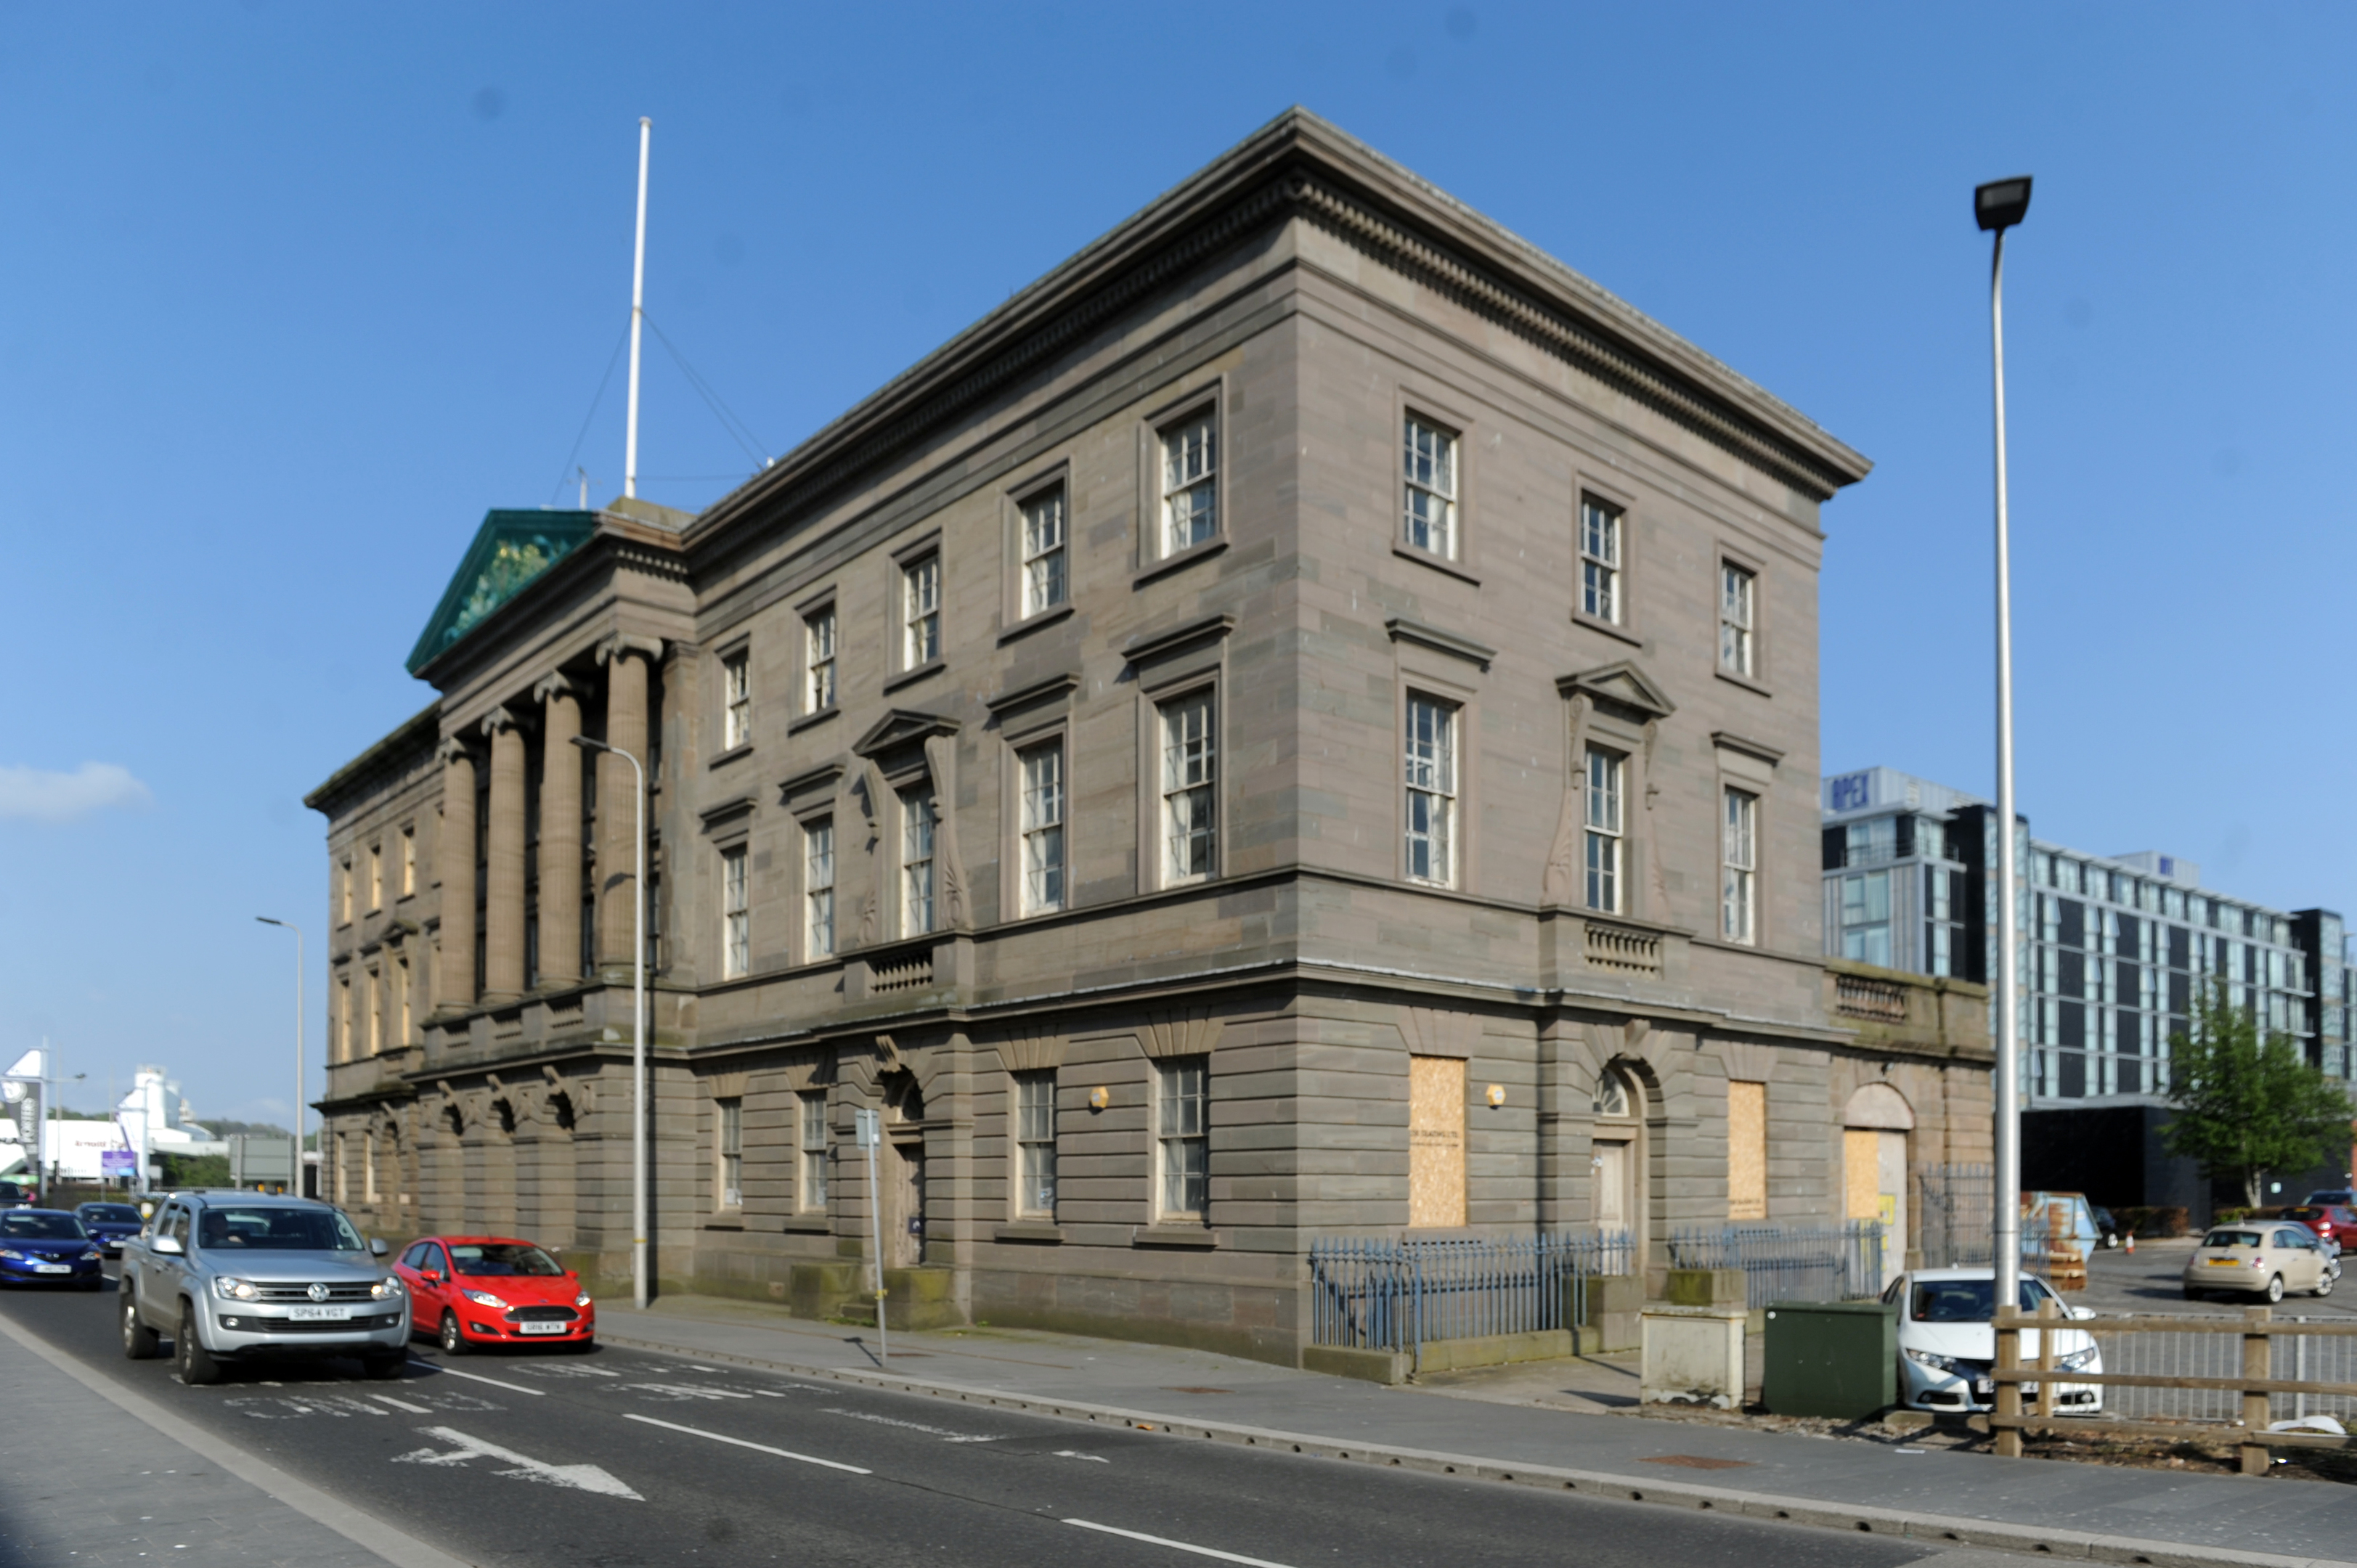 The Custom House in Dundee.